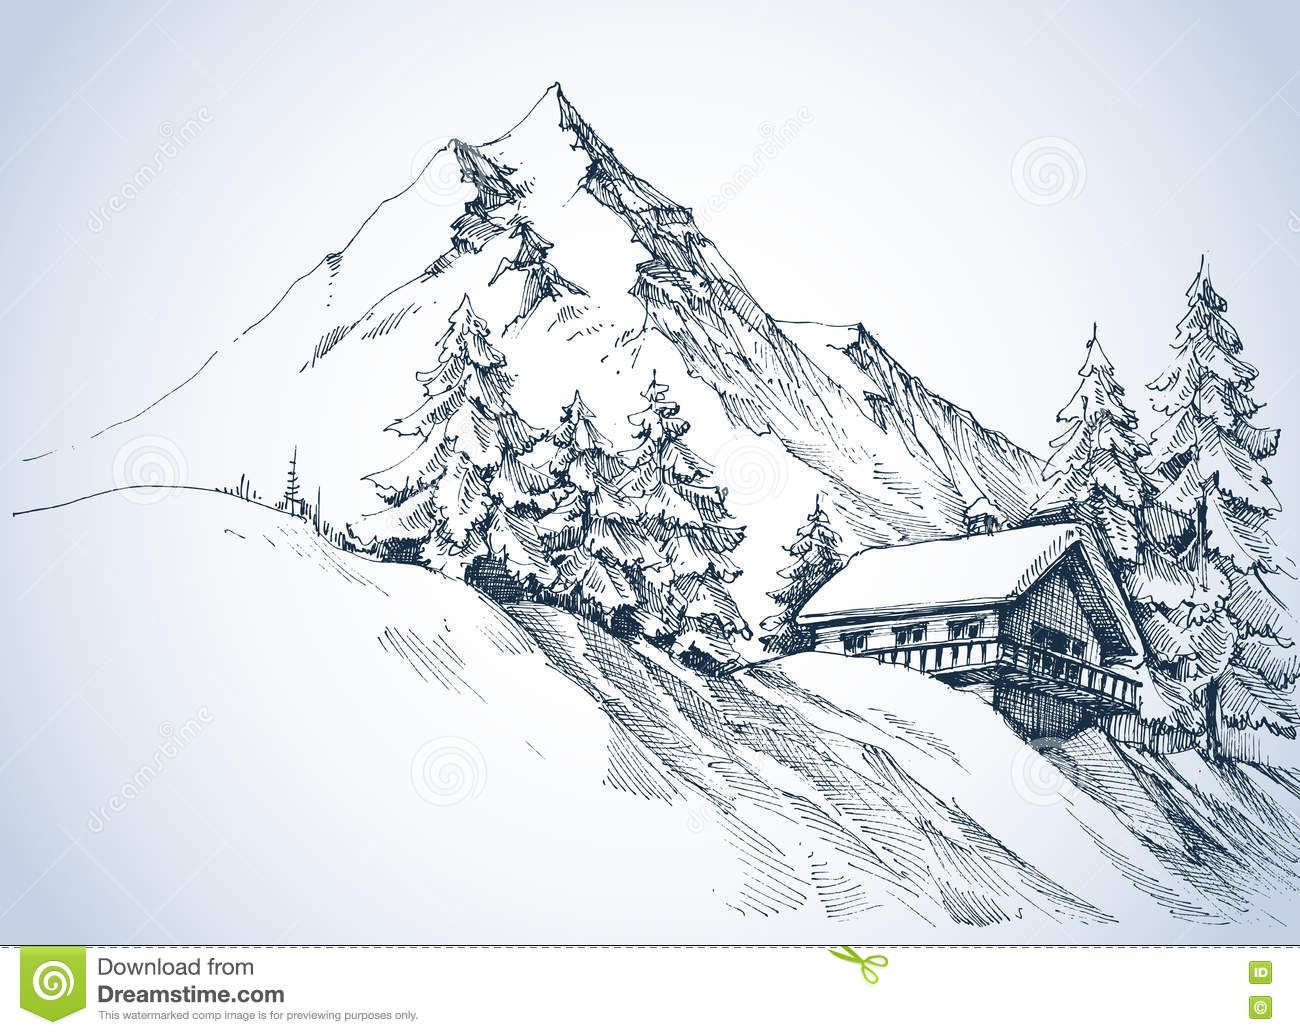 Jared Kohn Mountain Lines Brings Us A Cool Penandink Nature Illustration Of A Mountain Cabin Overloo Risunki Perom Ruchechnoe Iskusstvo Naskalnaya Zhivopis